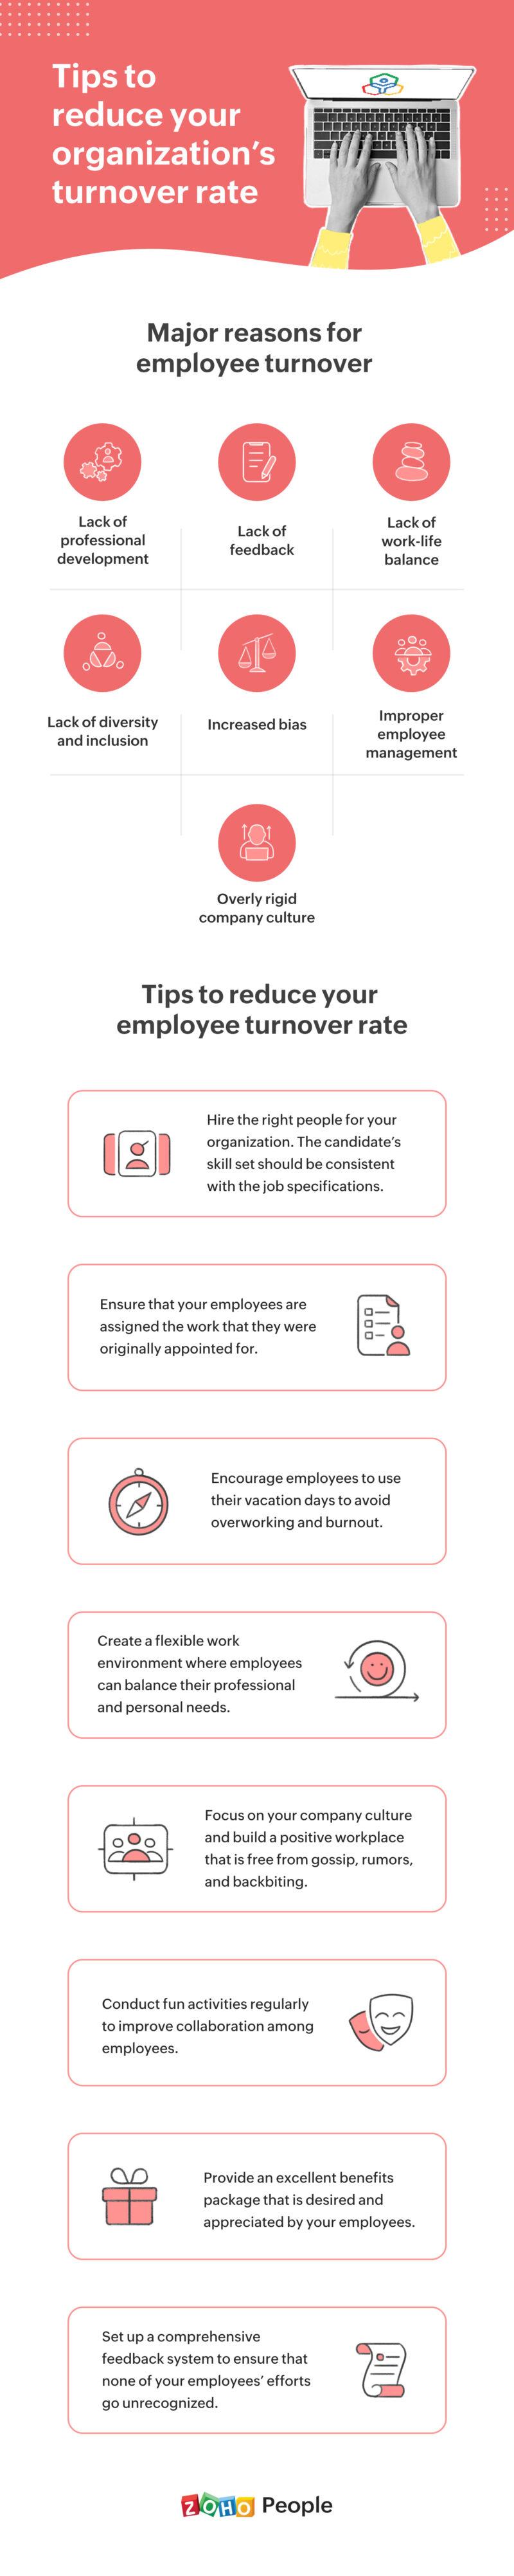 """Reducing employee turnover"""